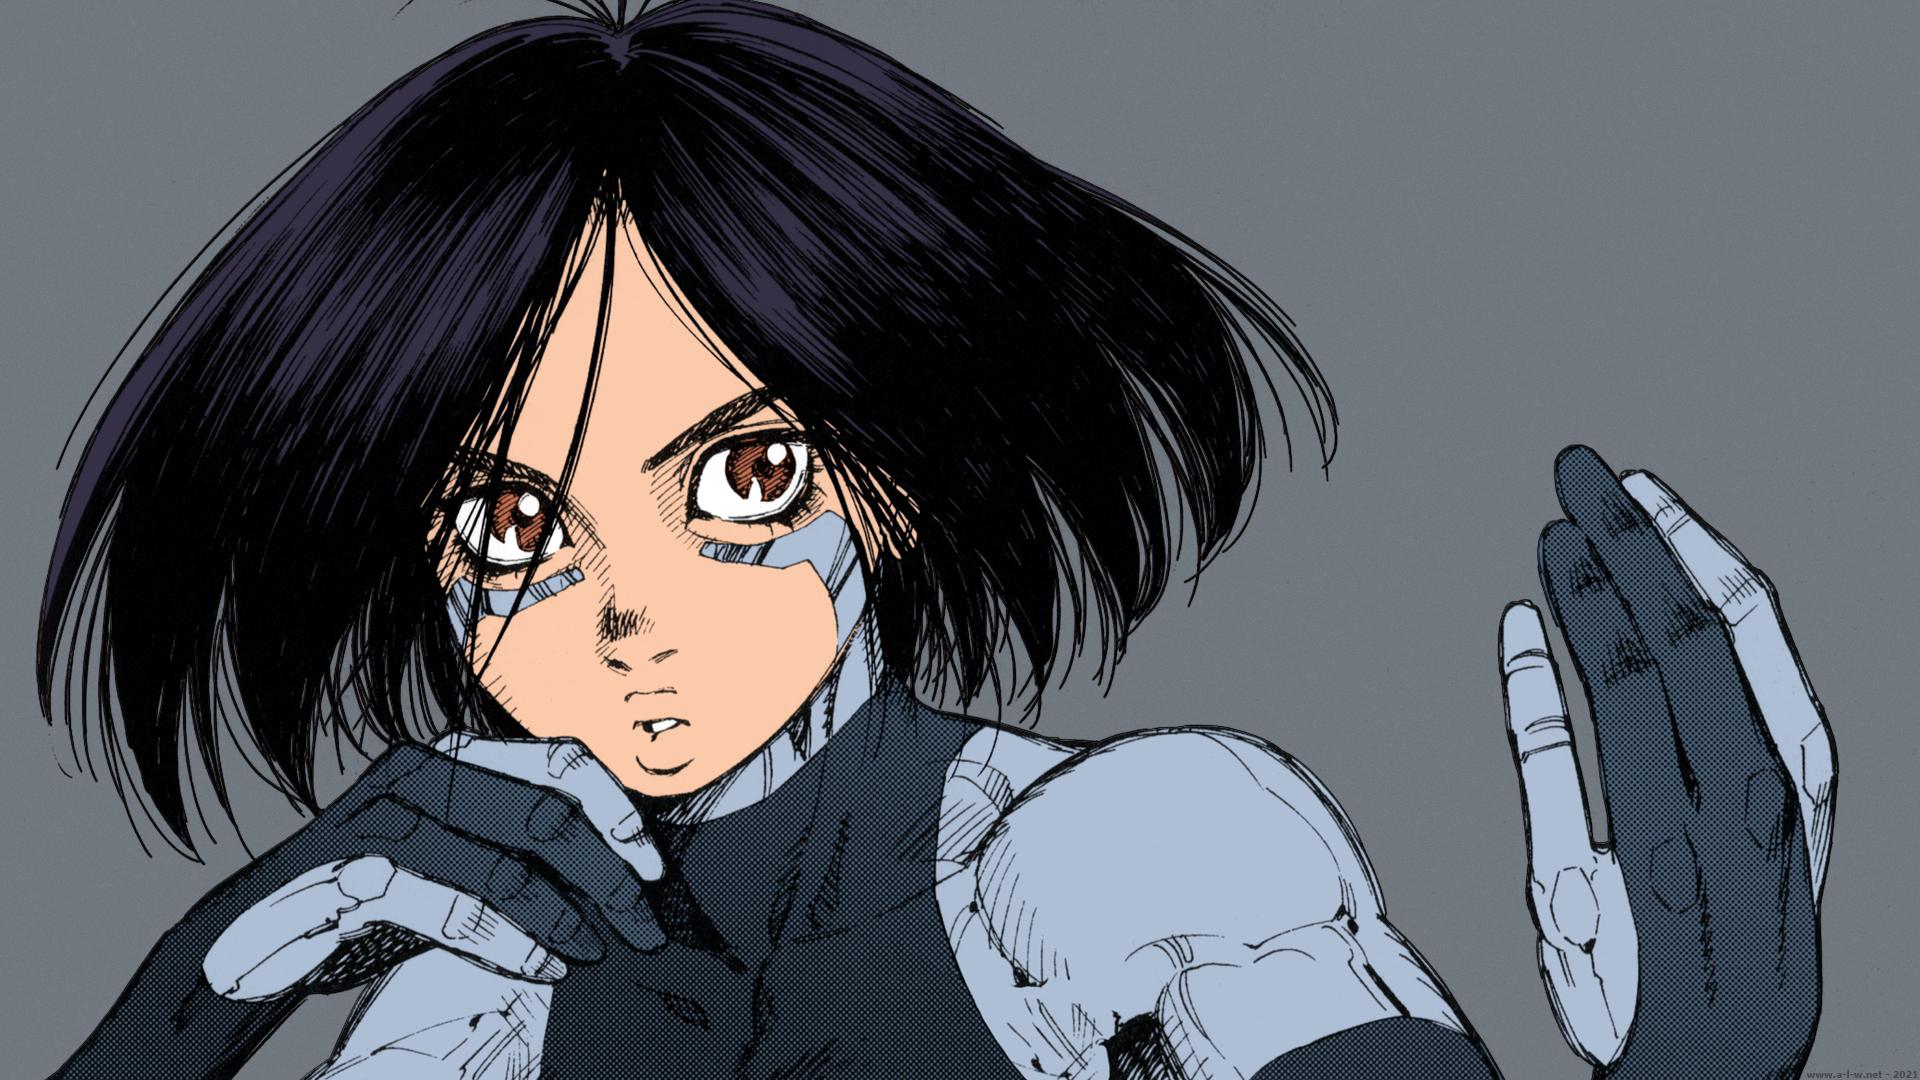 Anime 1920x1080 Battle Angel Alita Alita: Battle Angel GUNNM Gally Alita Yukito Kishiro short hair black hair brown eyes cyborg anime manga anime girls